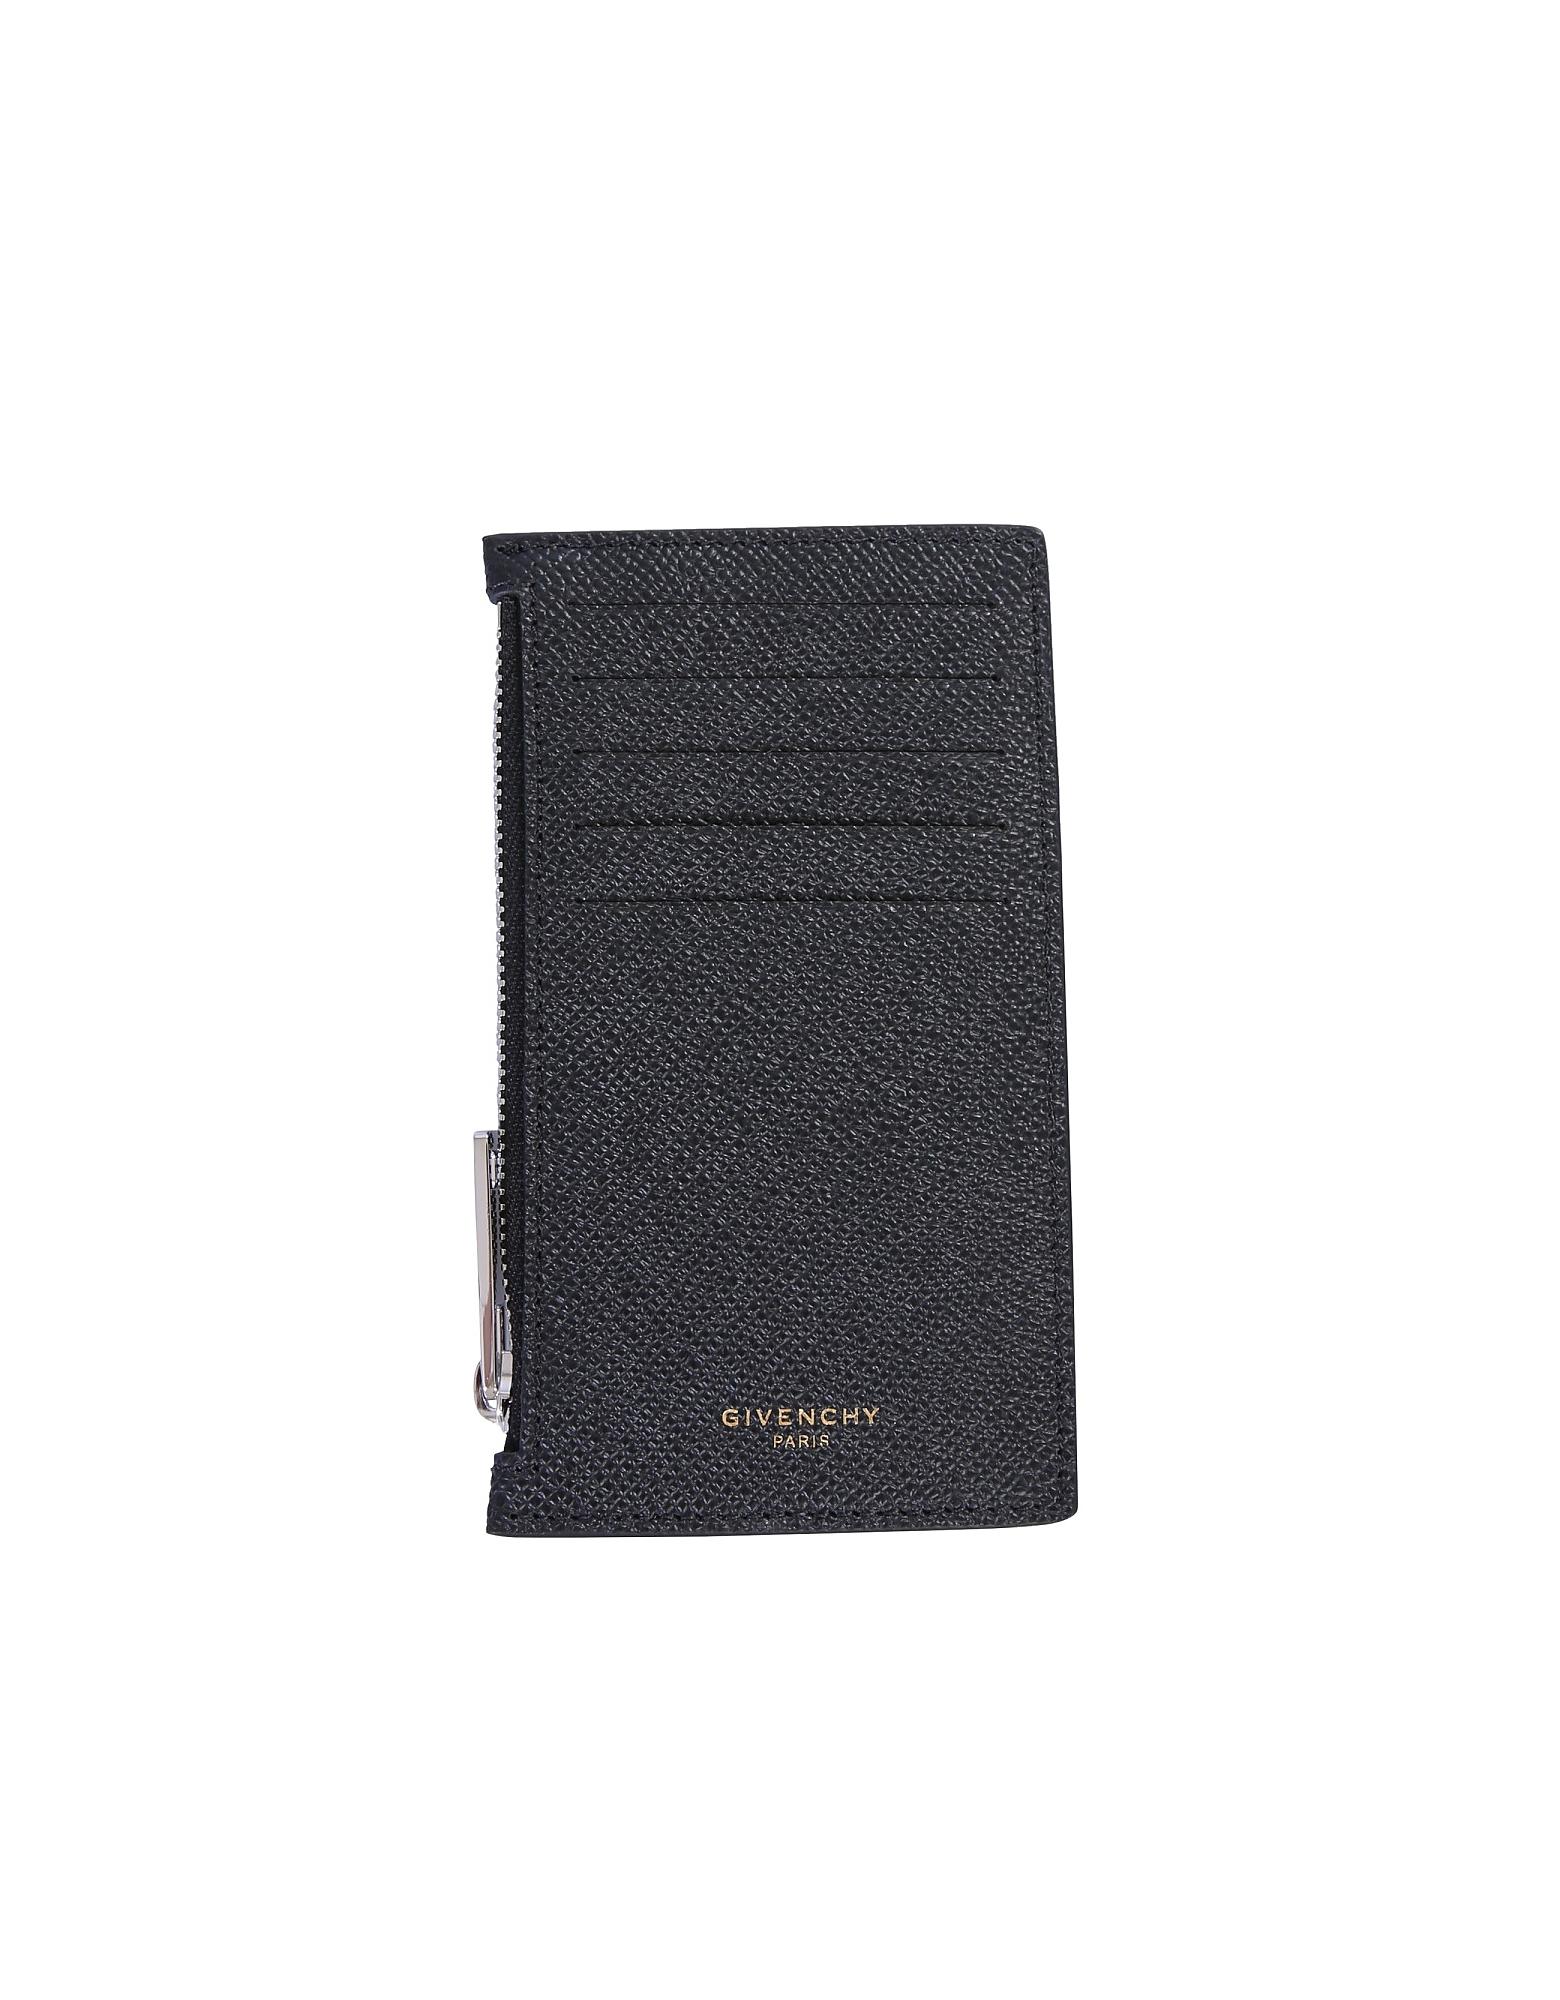 Givenchy Designer Men's Bags, Card Holder With Logo